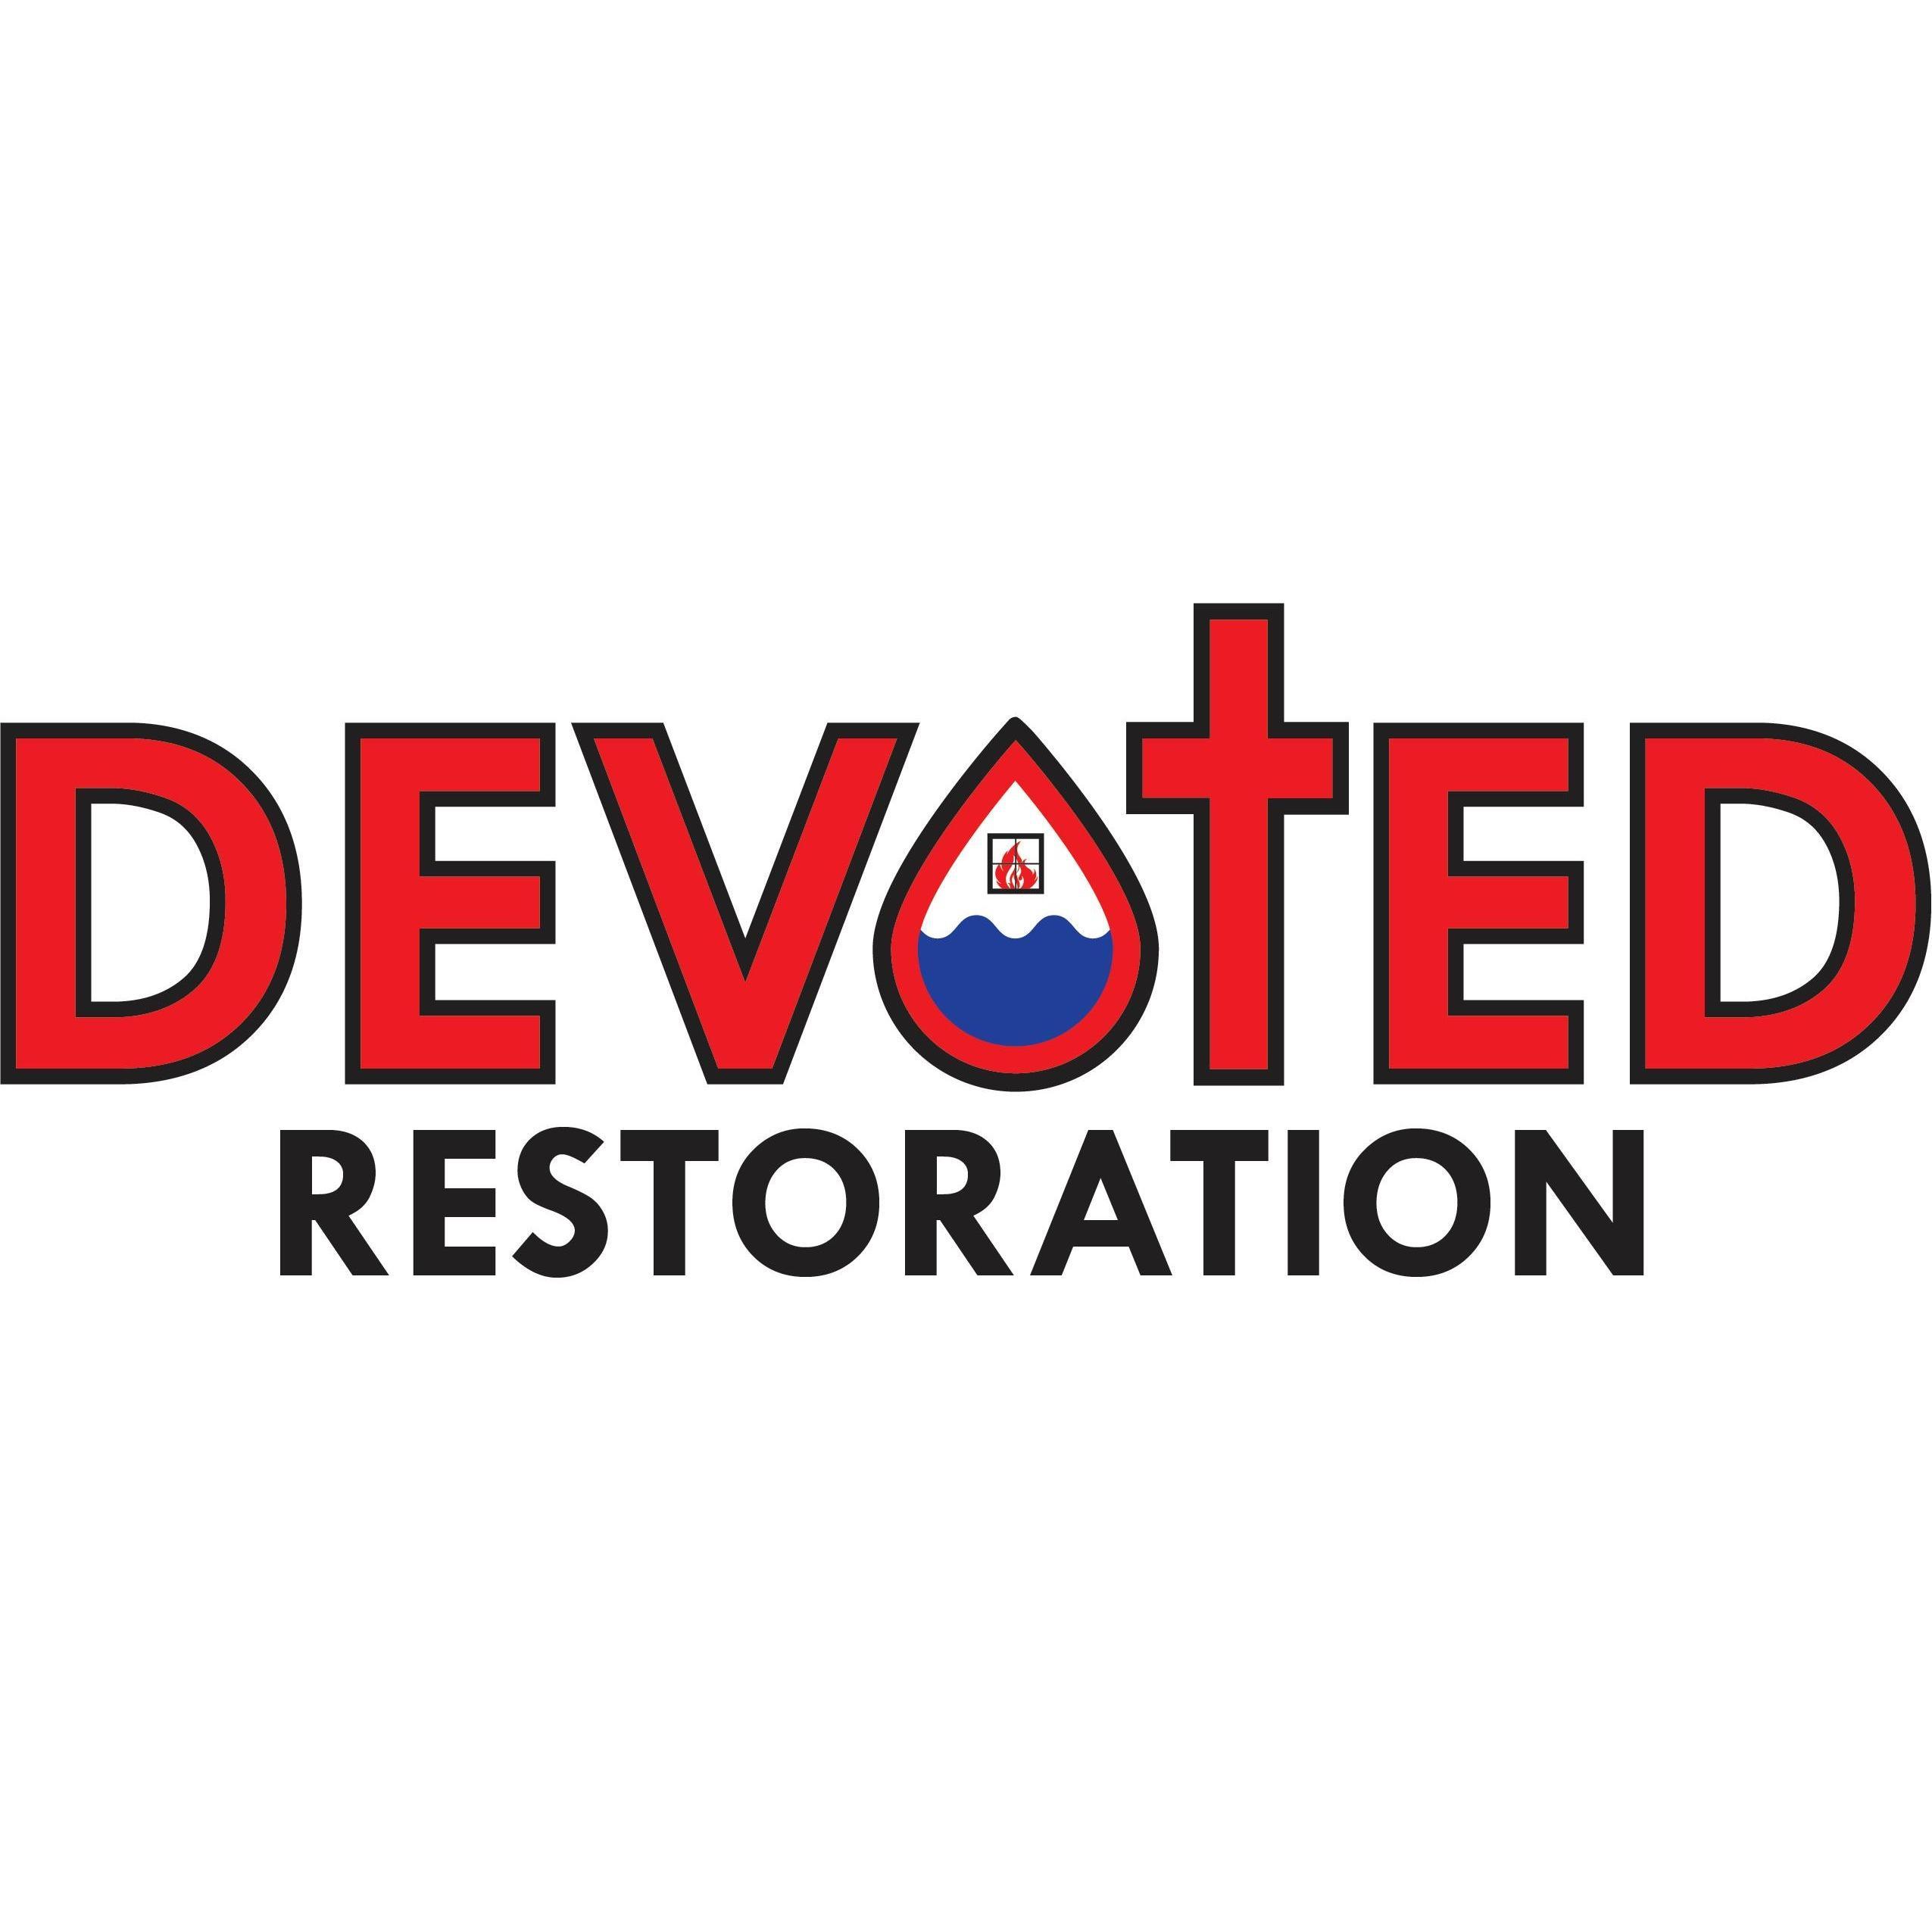 Devoted Restoration image 10